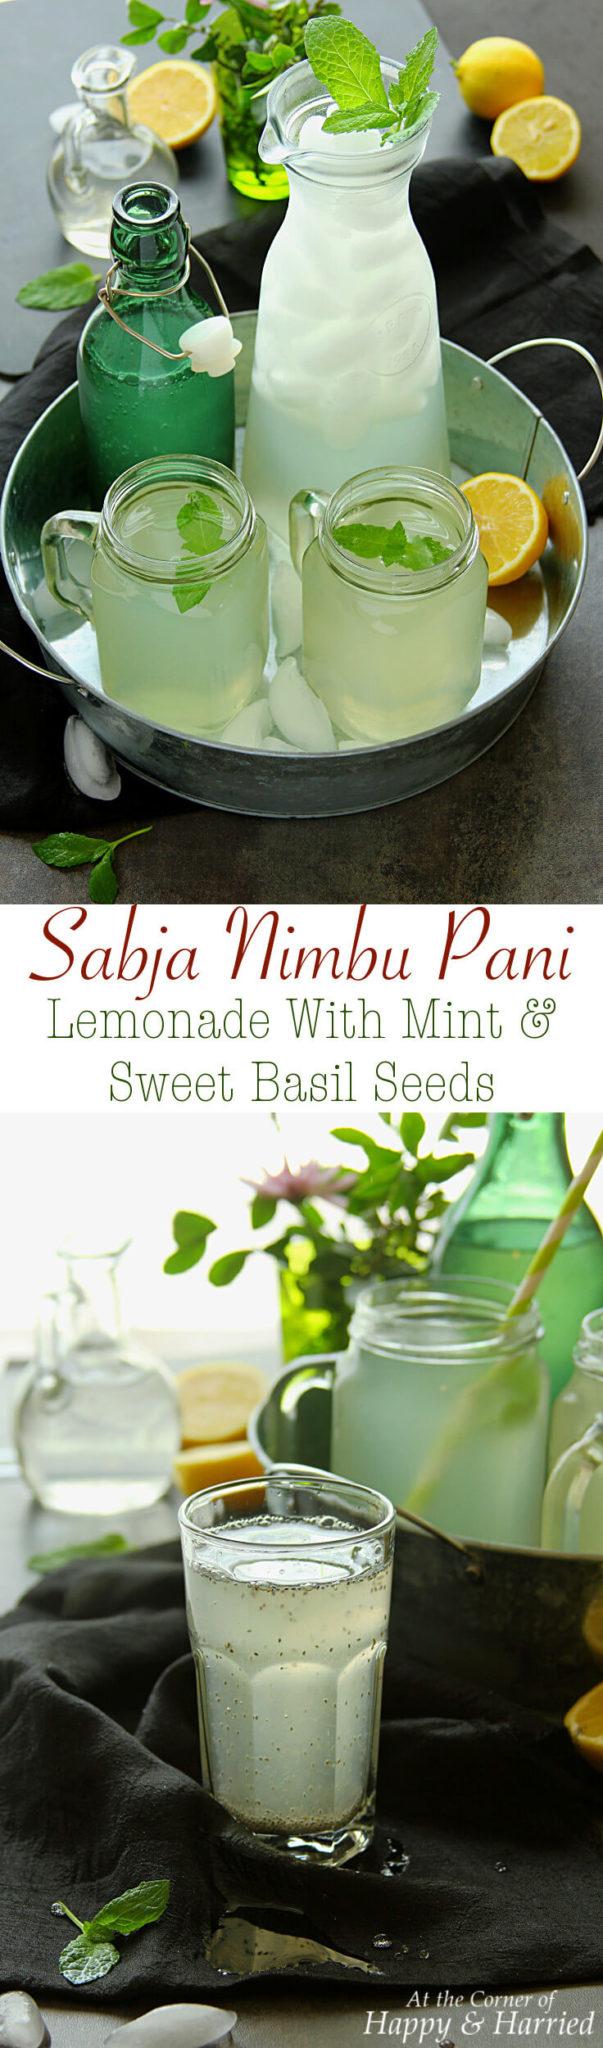 SABJA NIMBU PANI (LEMONADE WITH MINT & SWEET BASIL SEEDS) - HAPPY&HARRIED